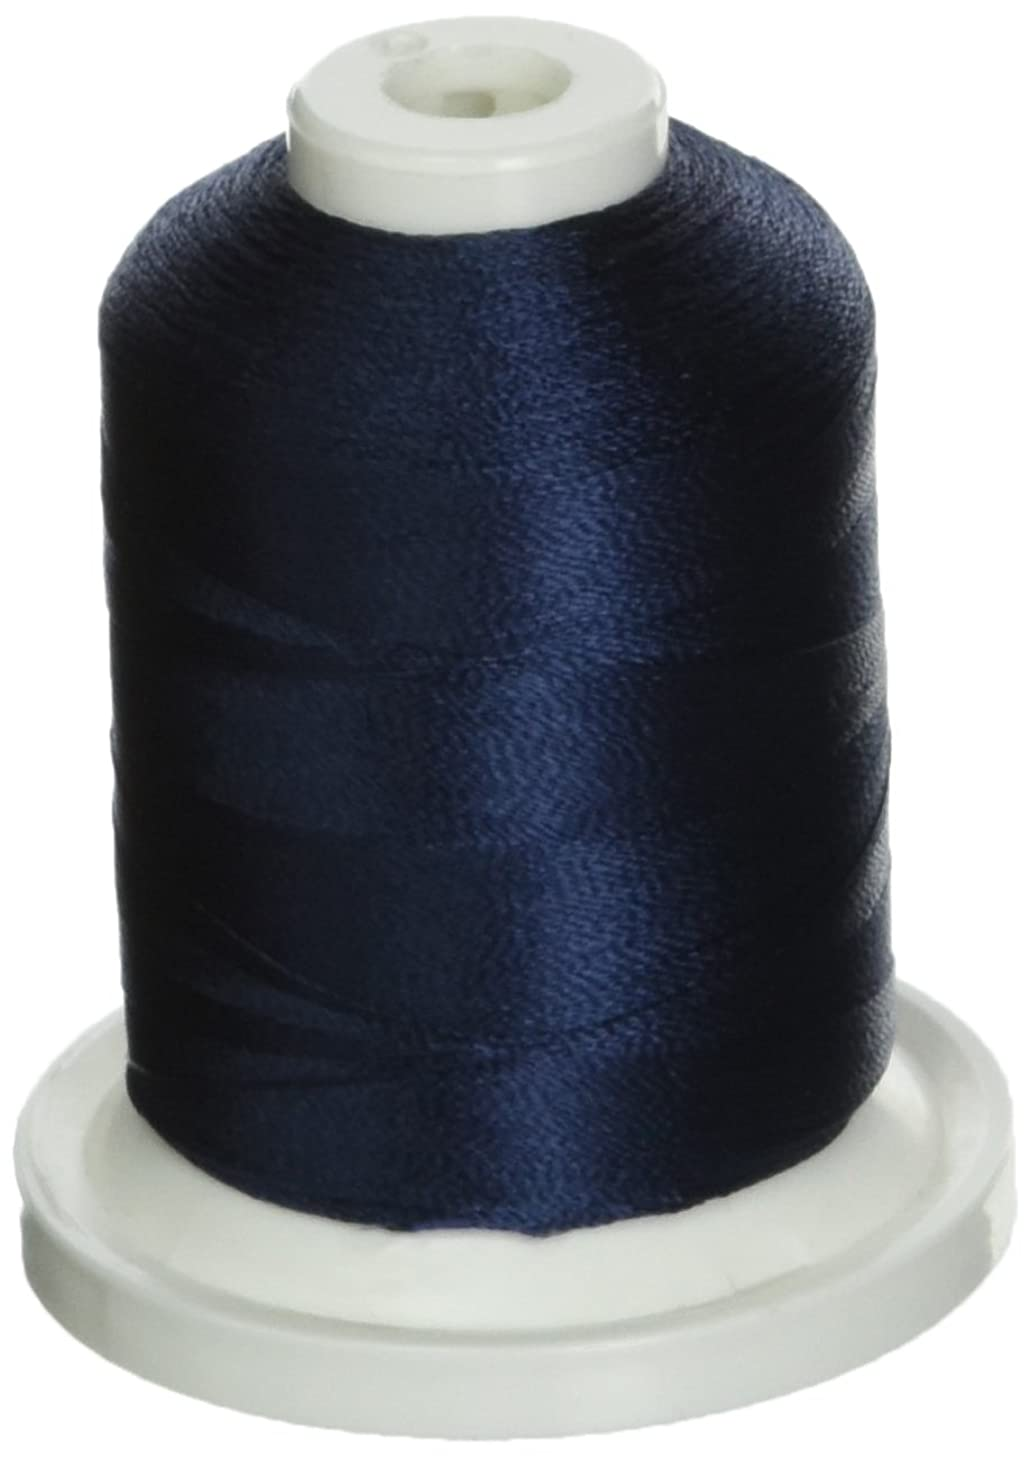 Robison-Anton Rayon Super Strength Thread, 1100-Yard, Pro-College Blue